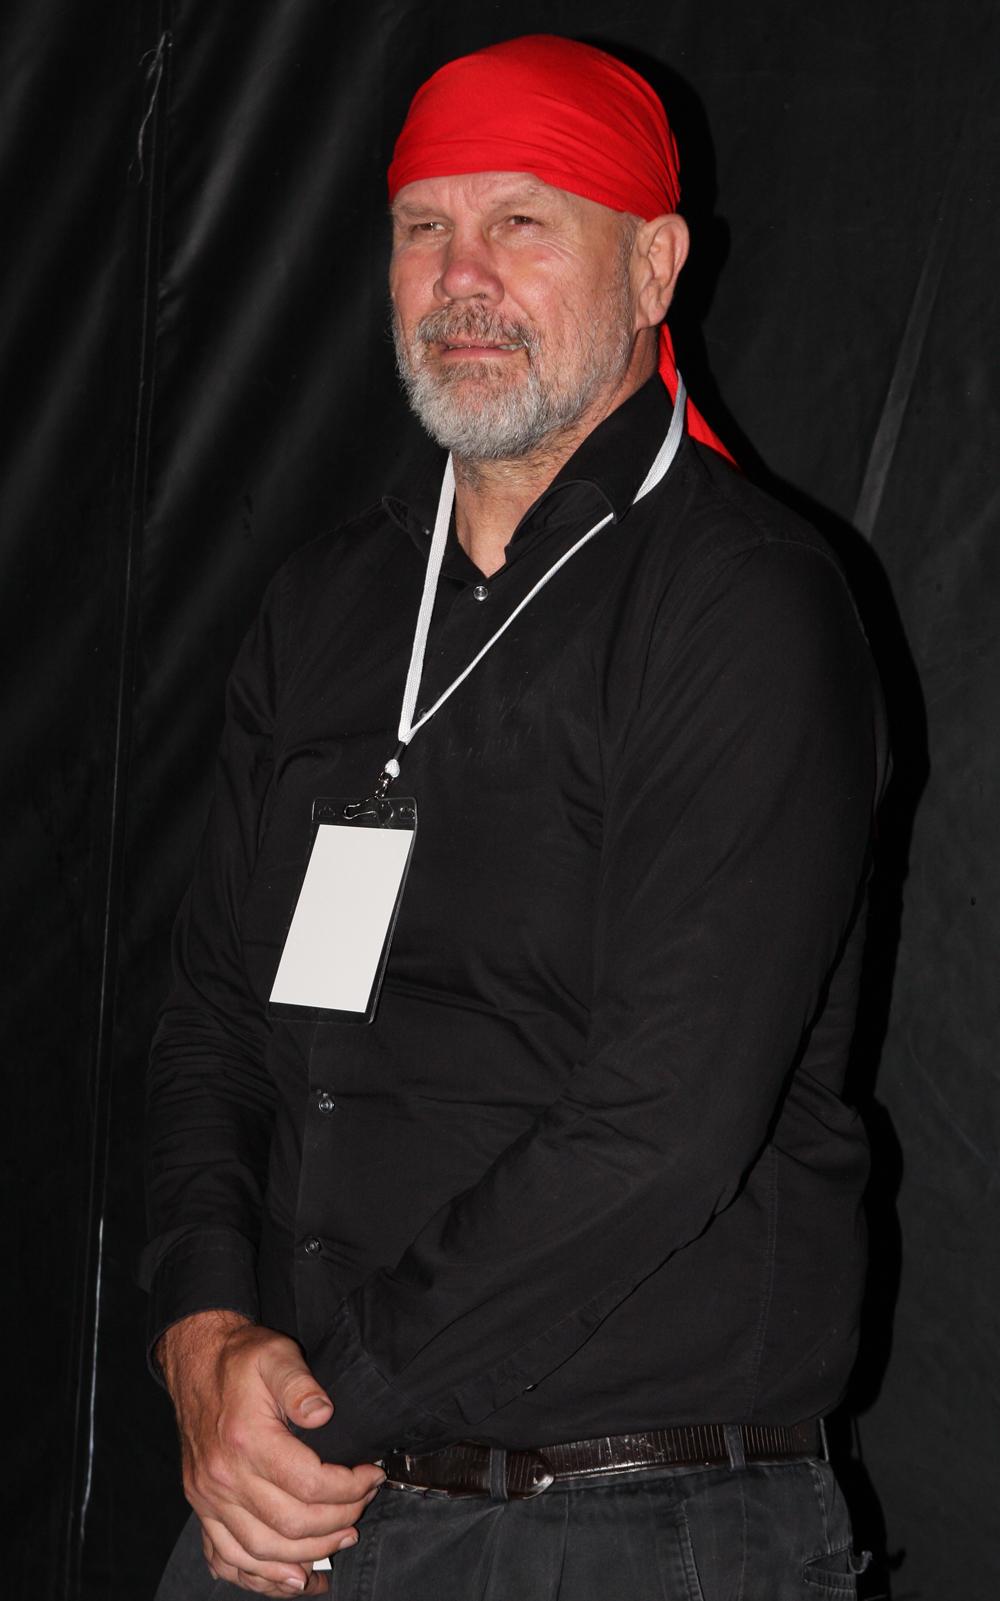 Peter FitzSimons - Wikipedia